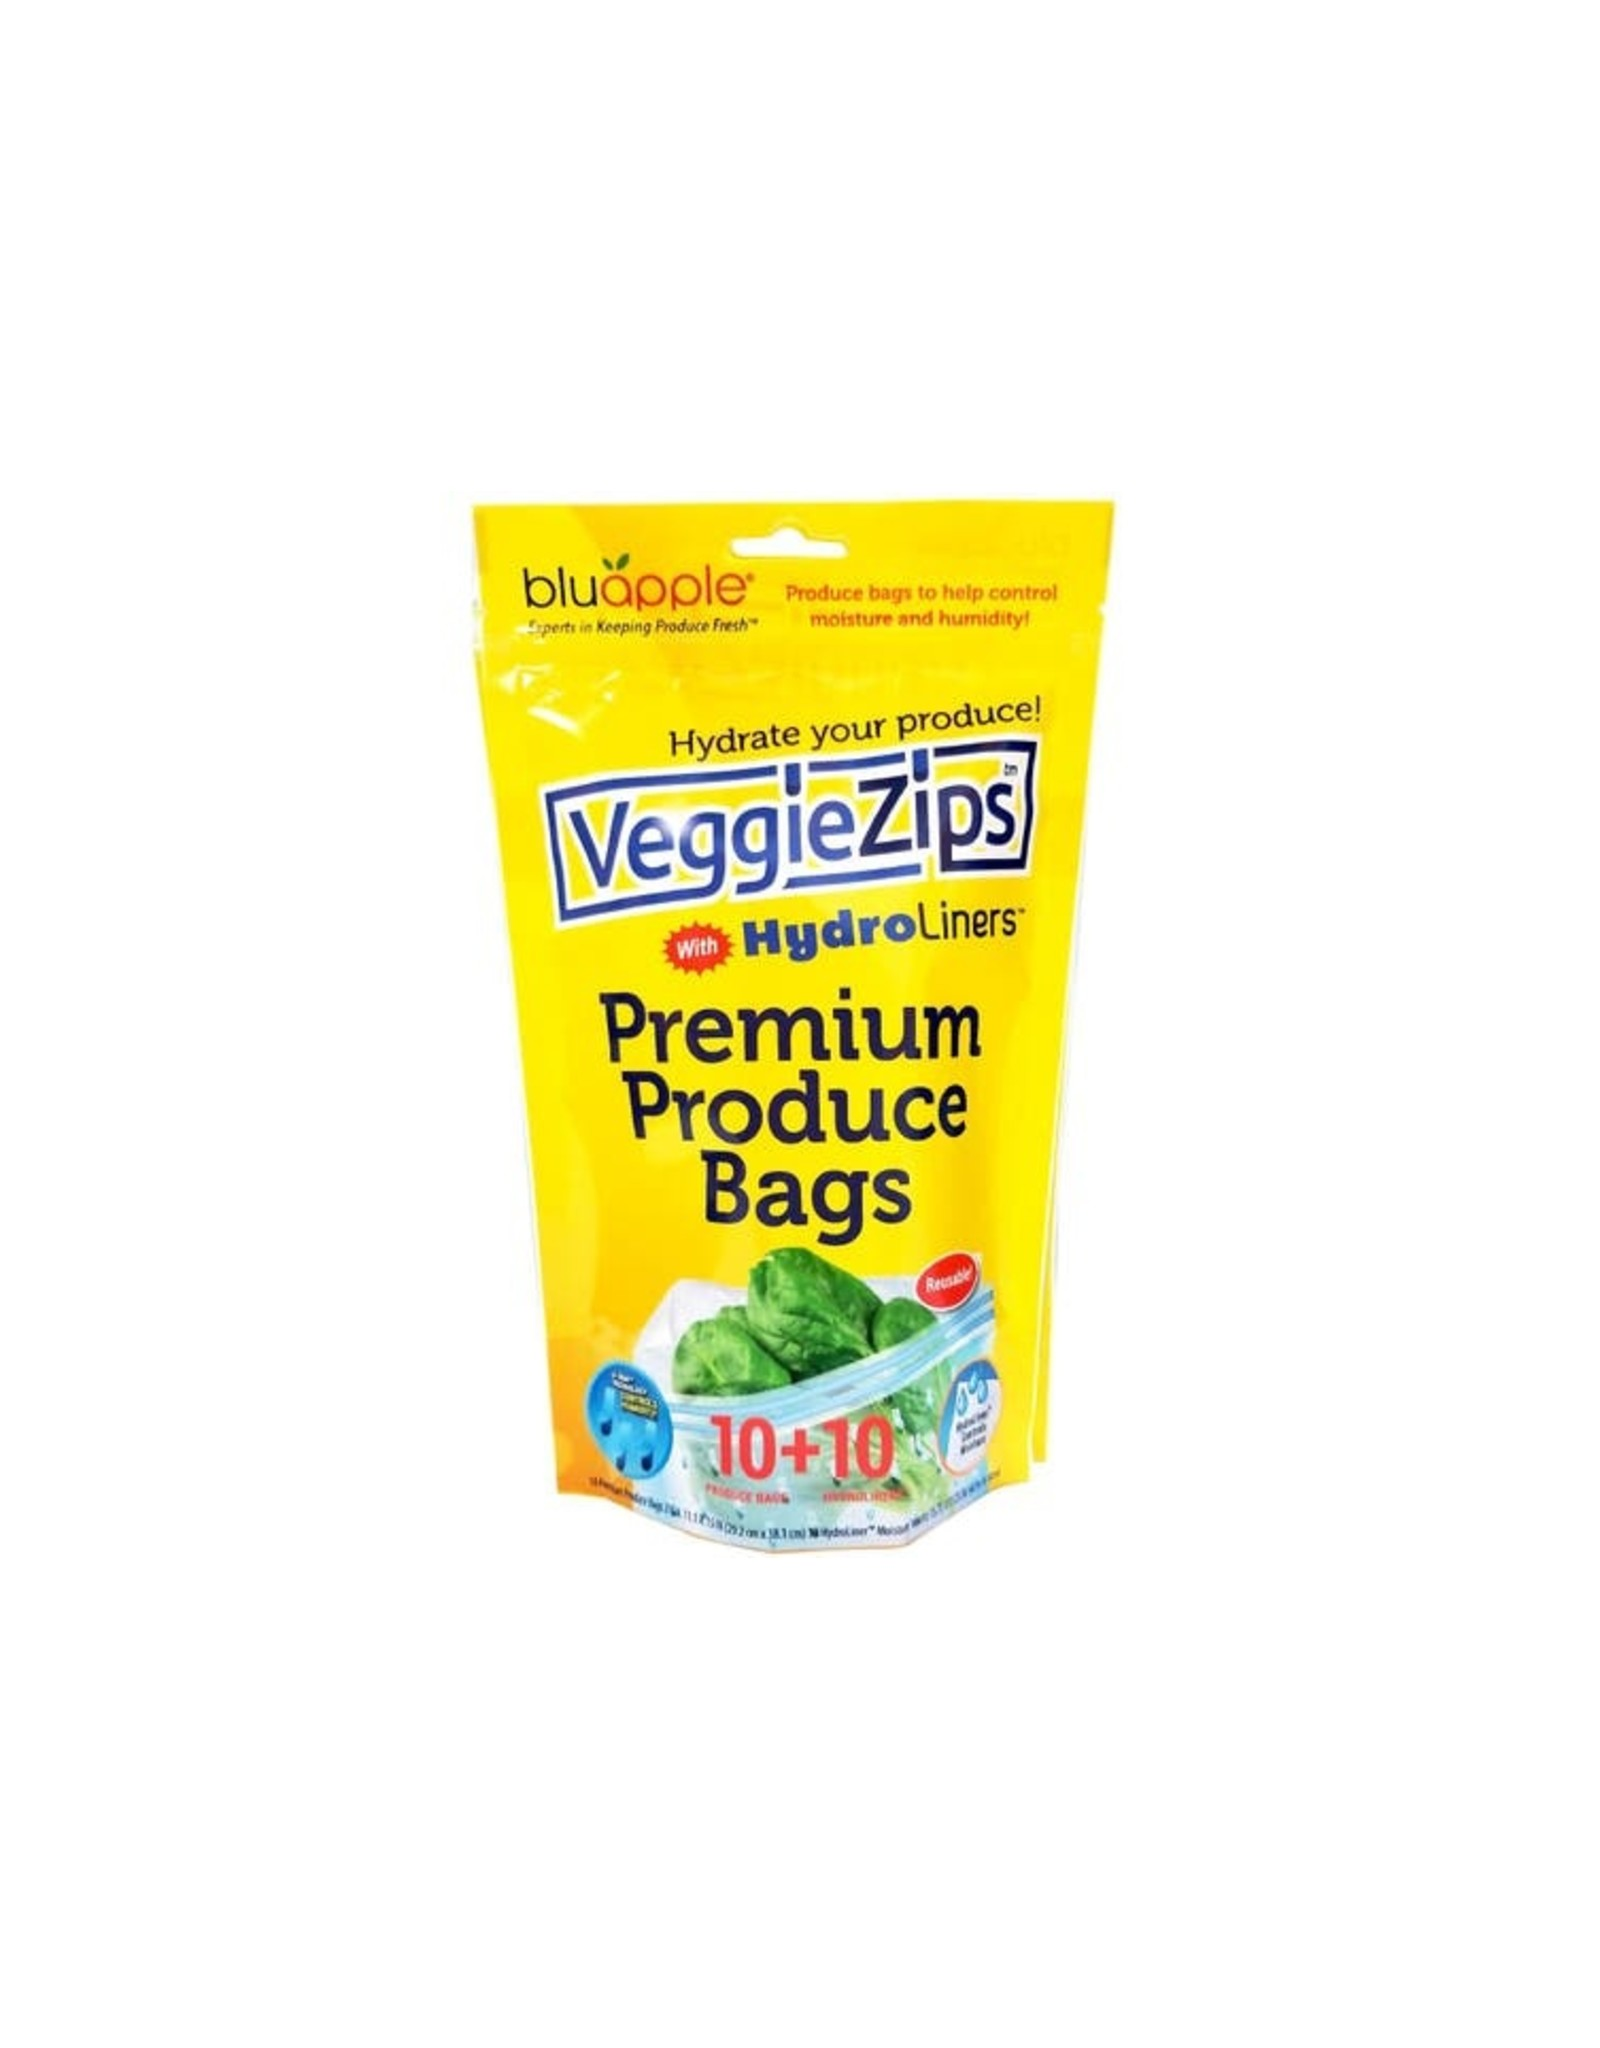 Bluapple VeggieZips Premium Produce Bags